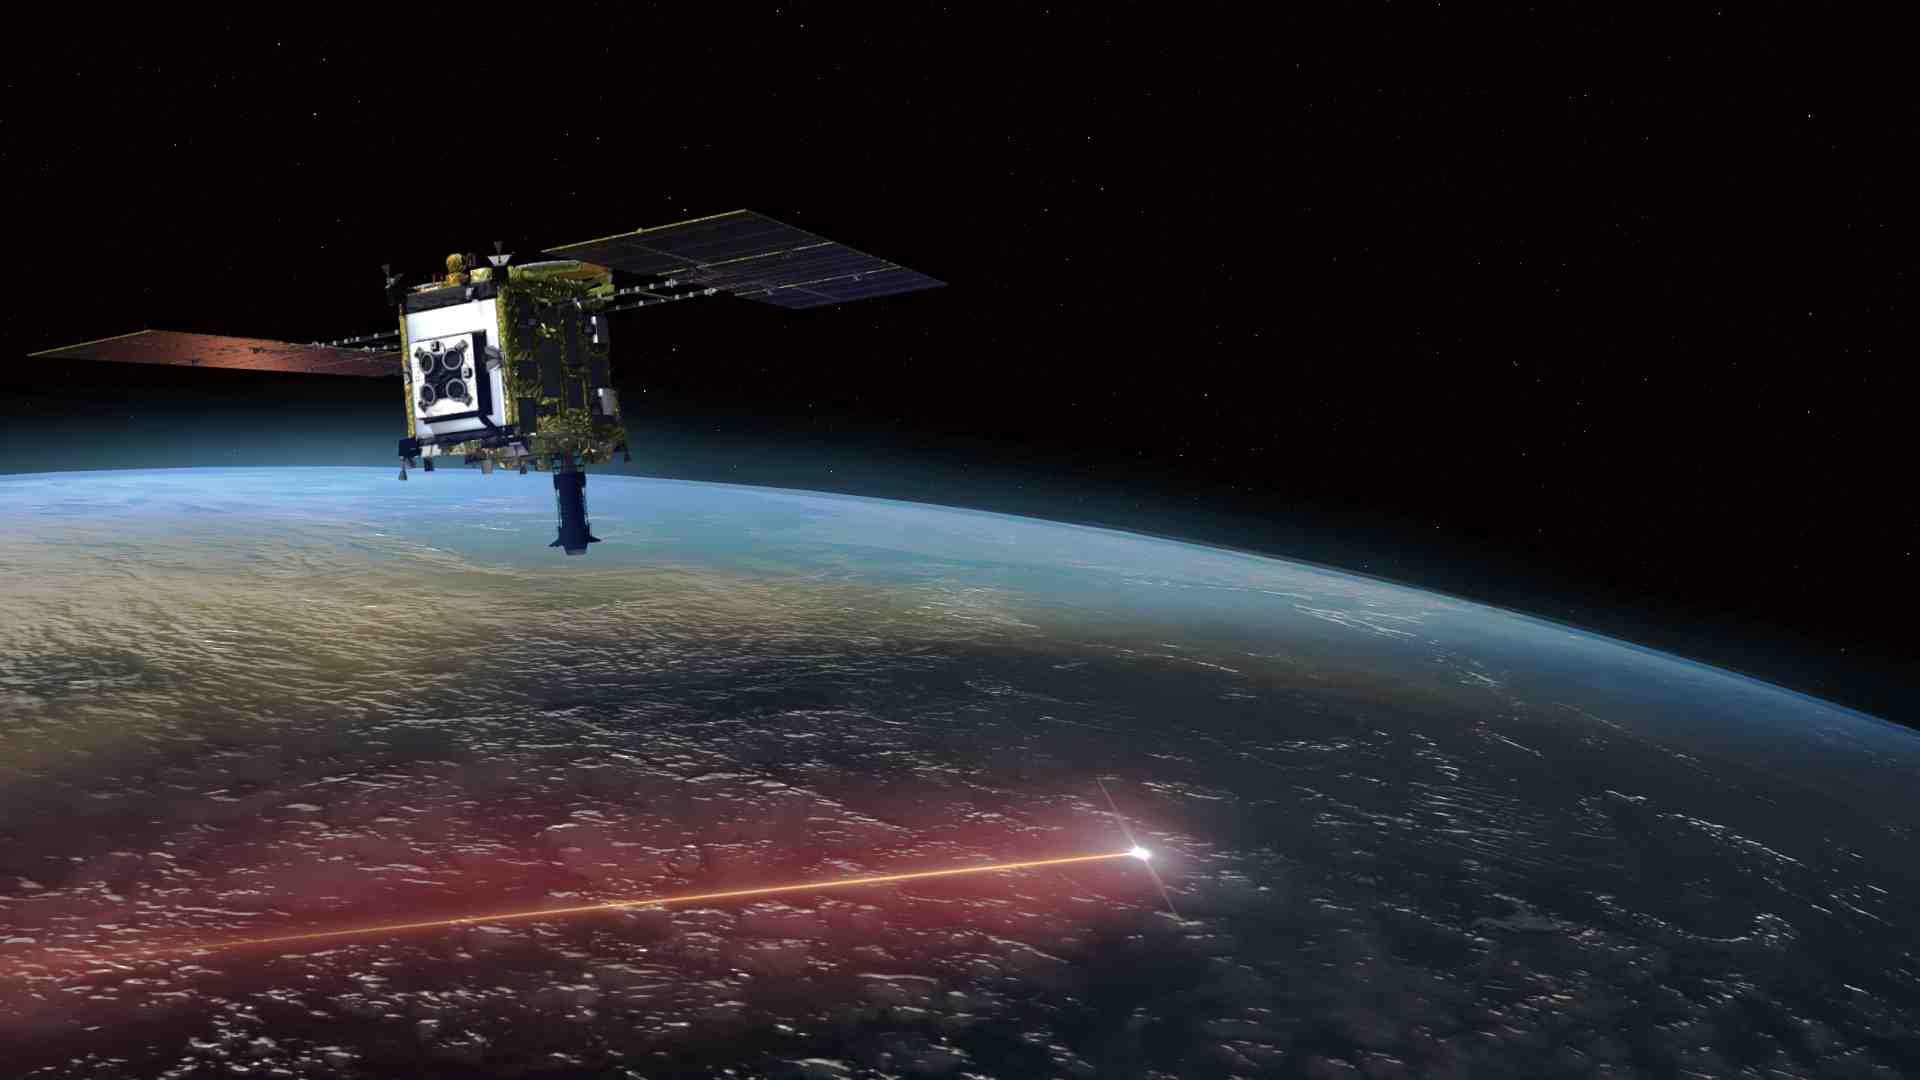 JAXA Space Probe Hayabusa2 004